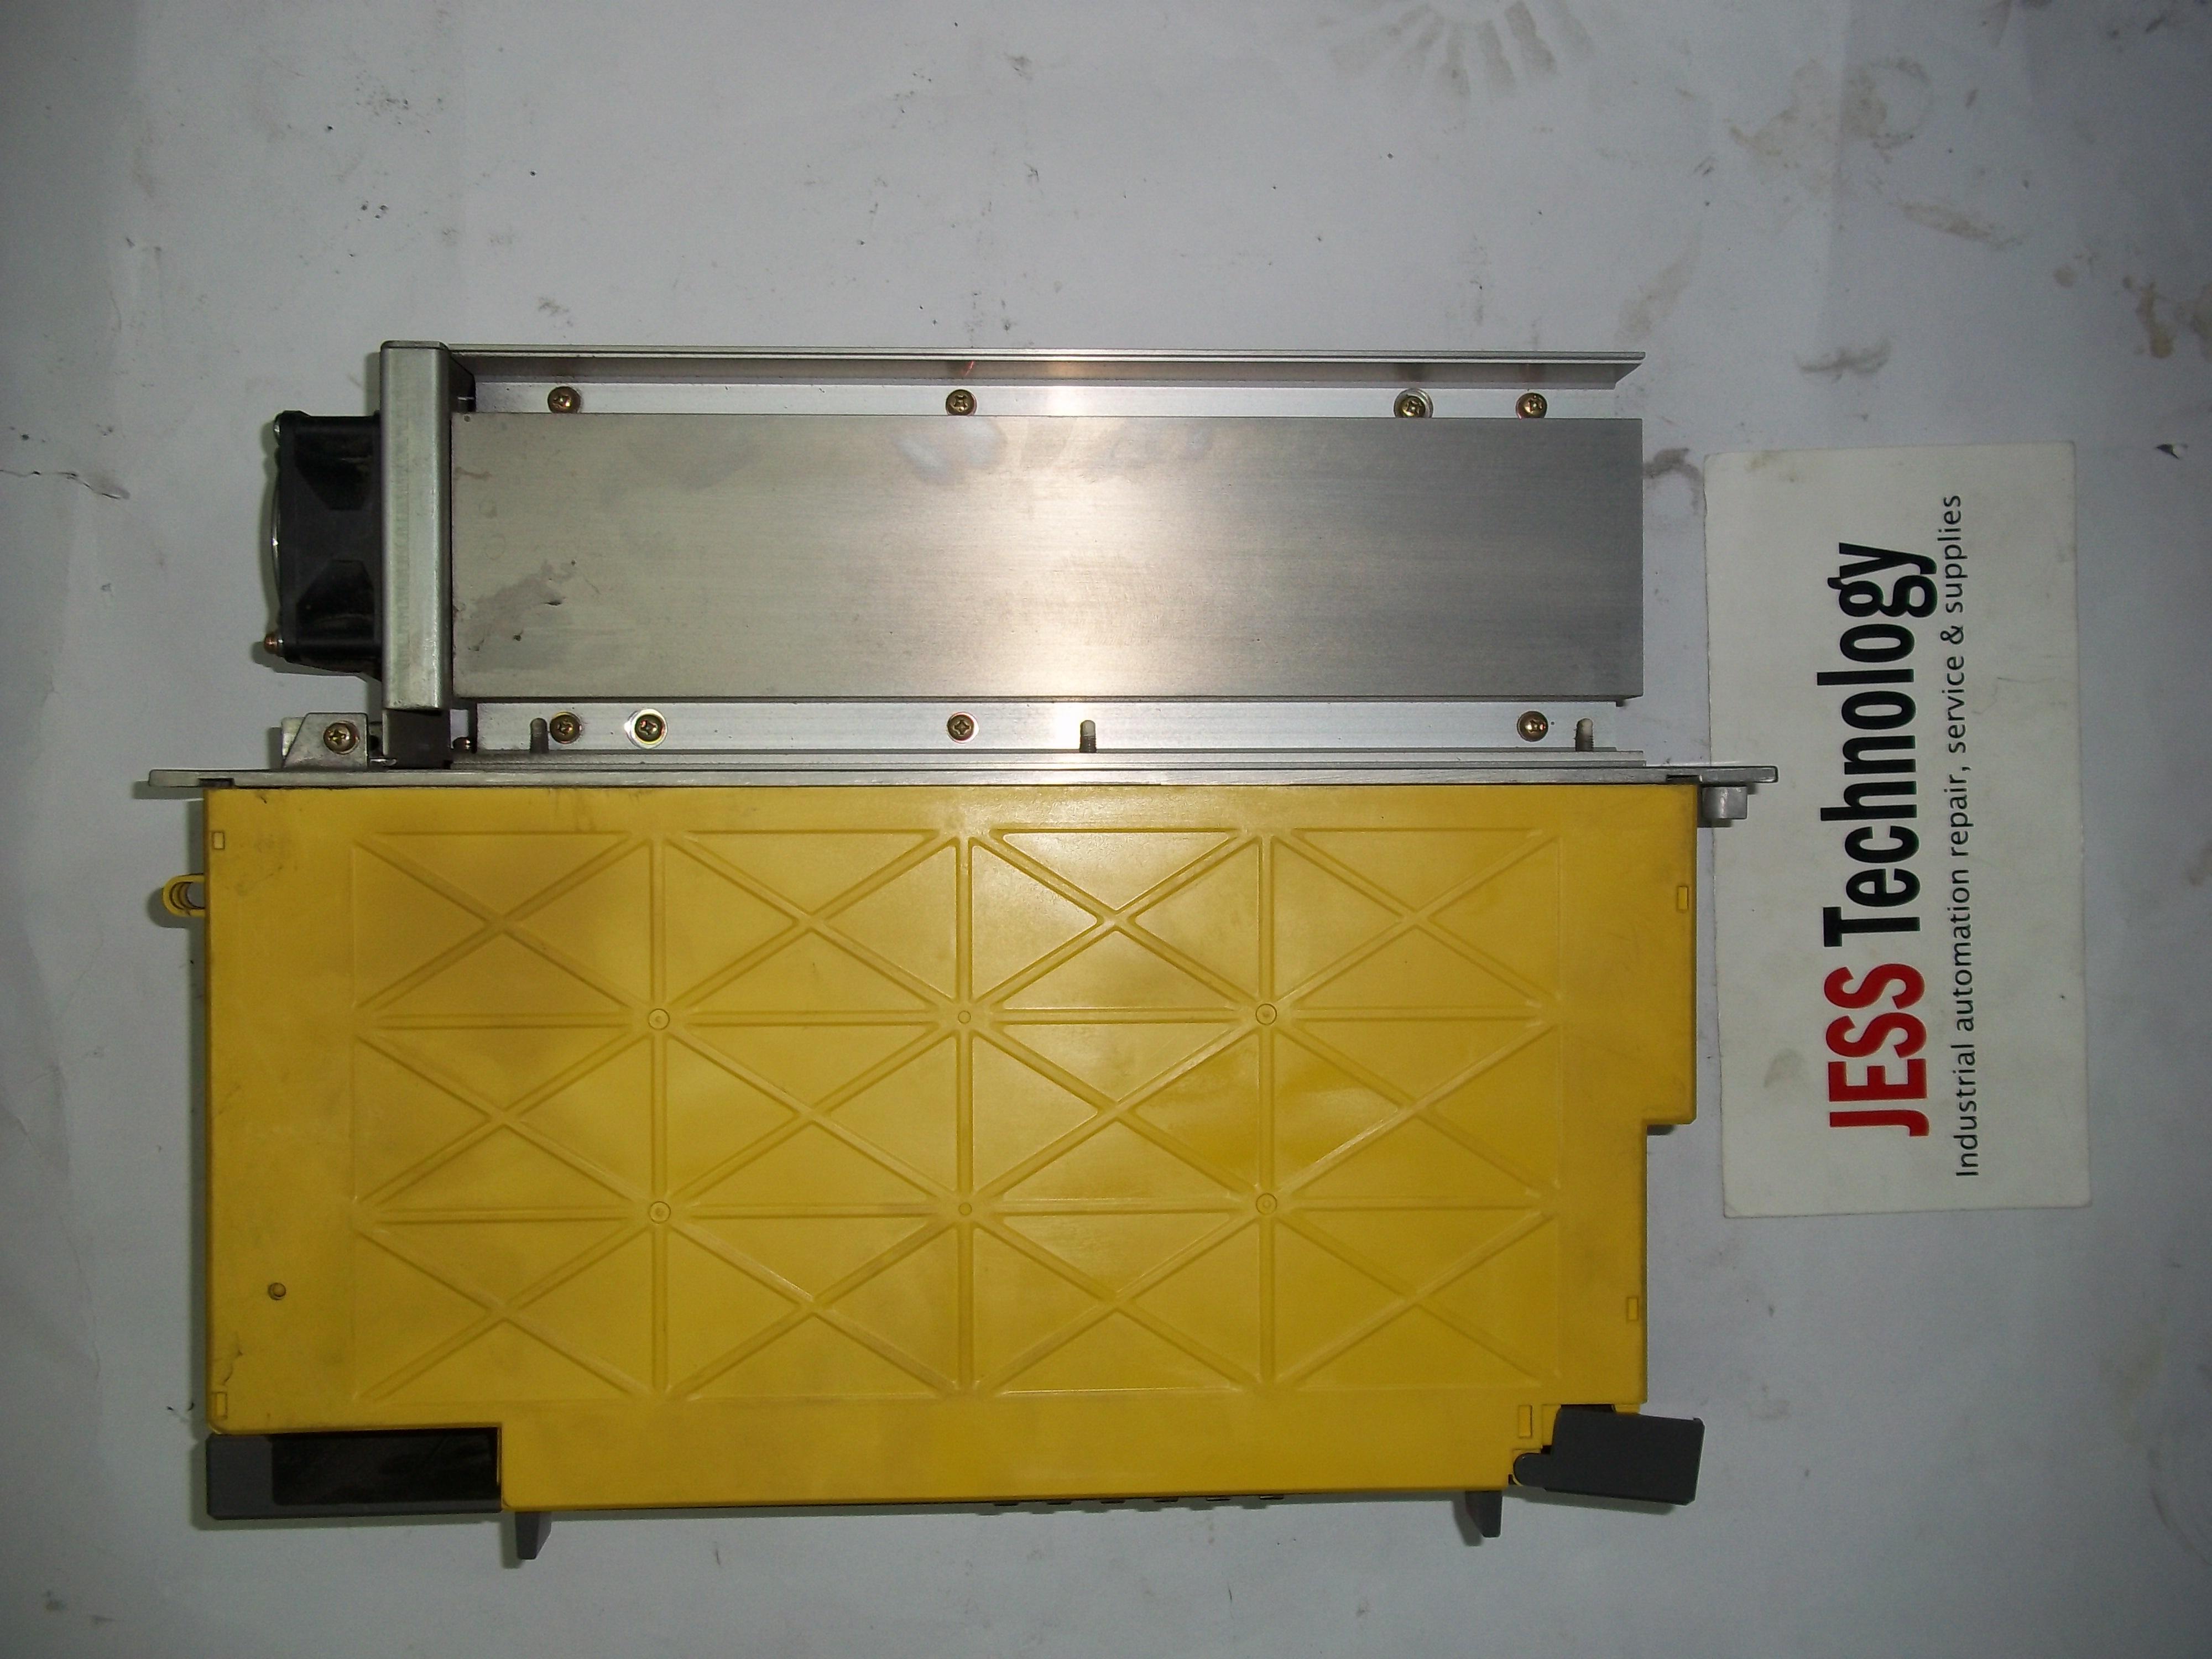 Repair D2348 FANUC FANUC SPINDLE AMPLIFIER MODULE A06B-6111-H011#H550B in Malaysia, Singapore, Thailand, Indonesia